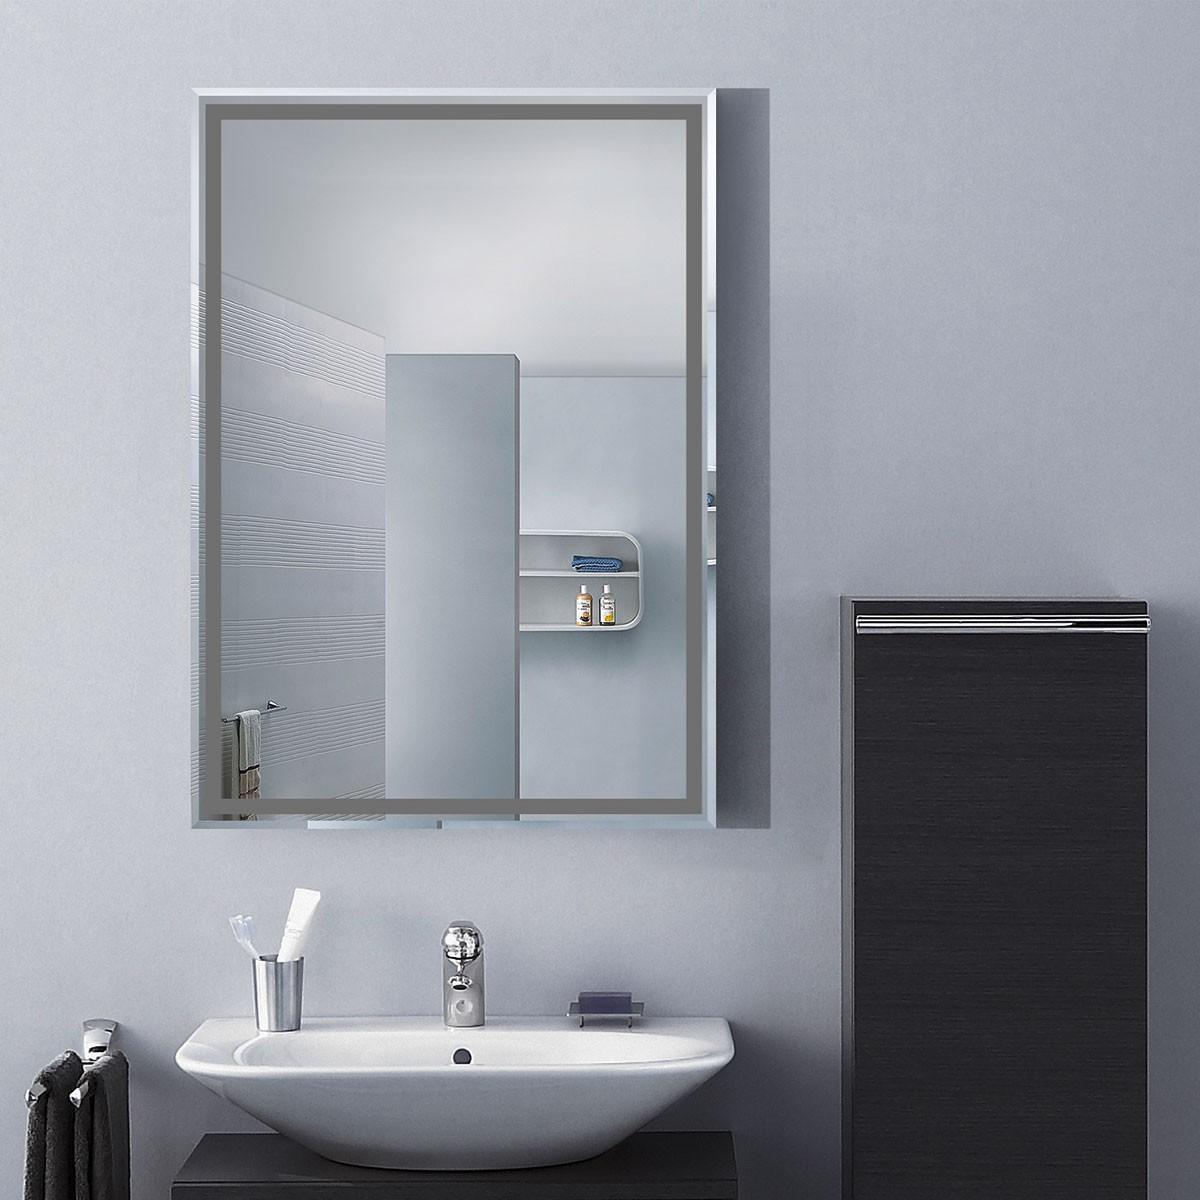 28 x 20 In. Wall-mounted Rectangle Bathroom Mirror (DK-OD-C226B ...